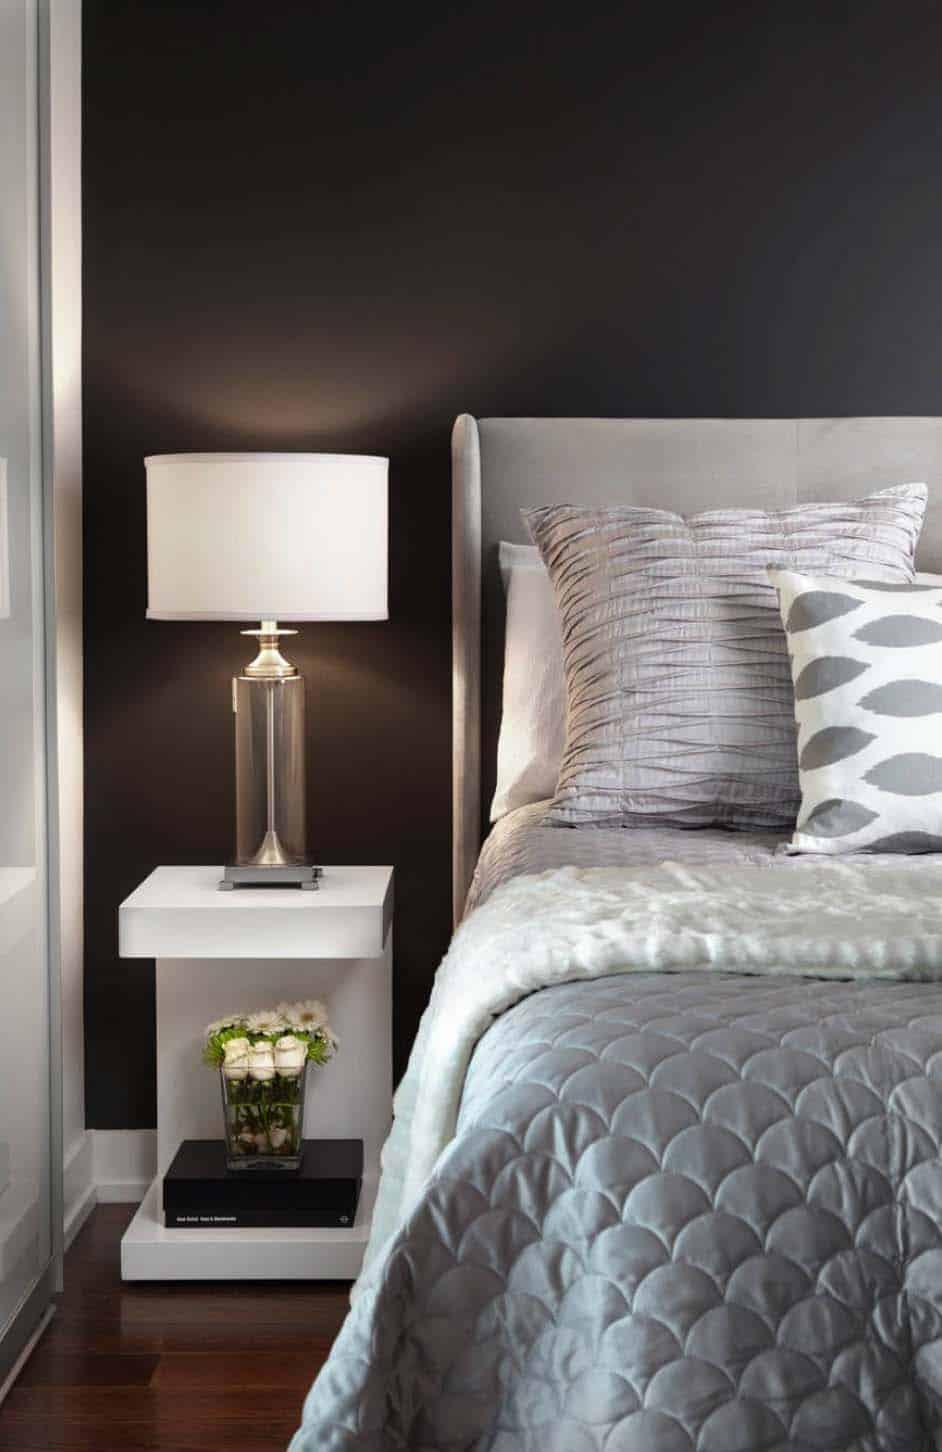 Contemporary Condo Suite-LUX Design-06-1 Kindesign